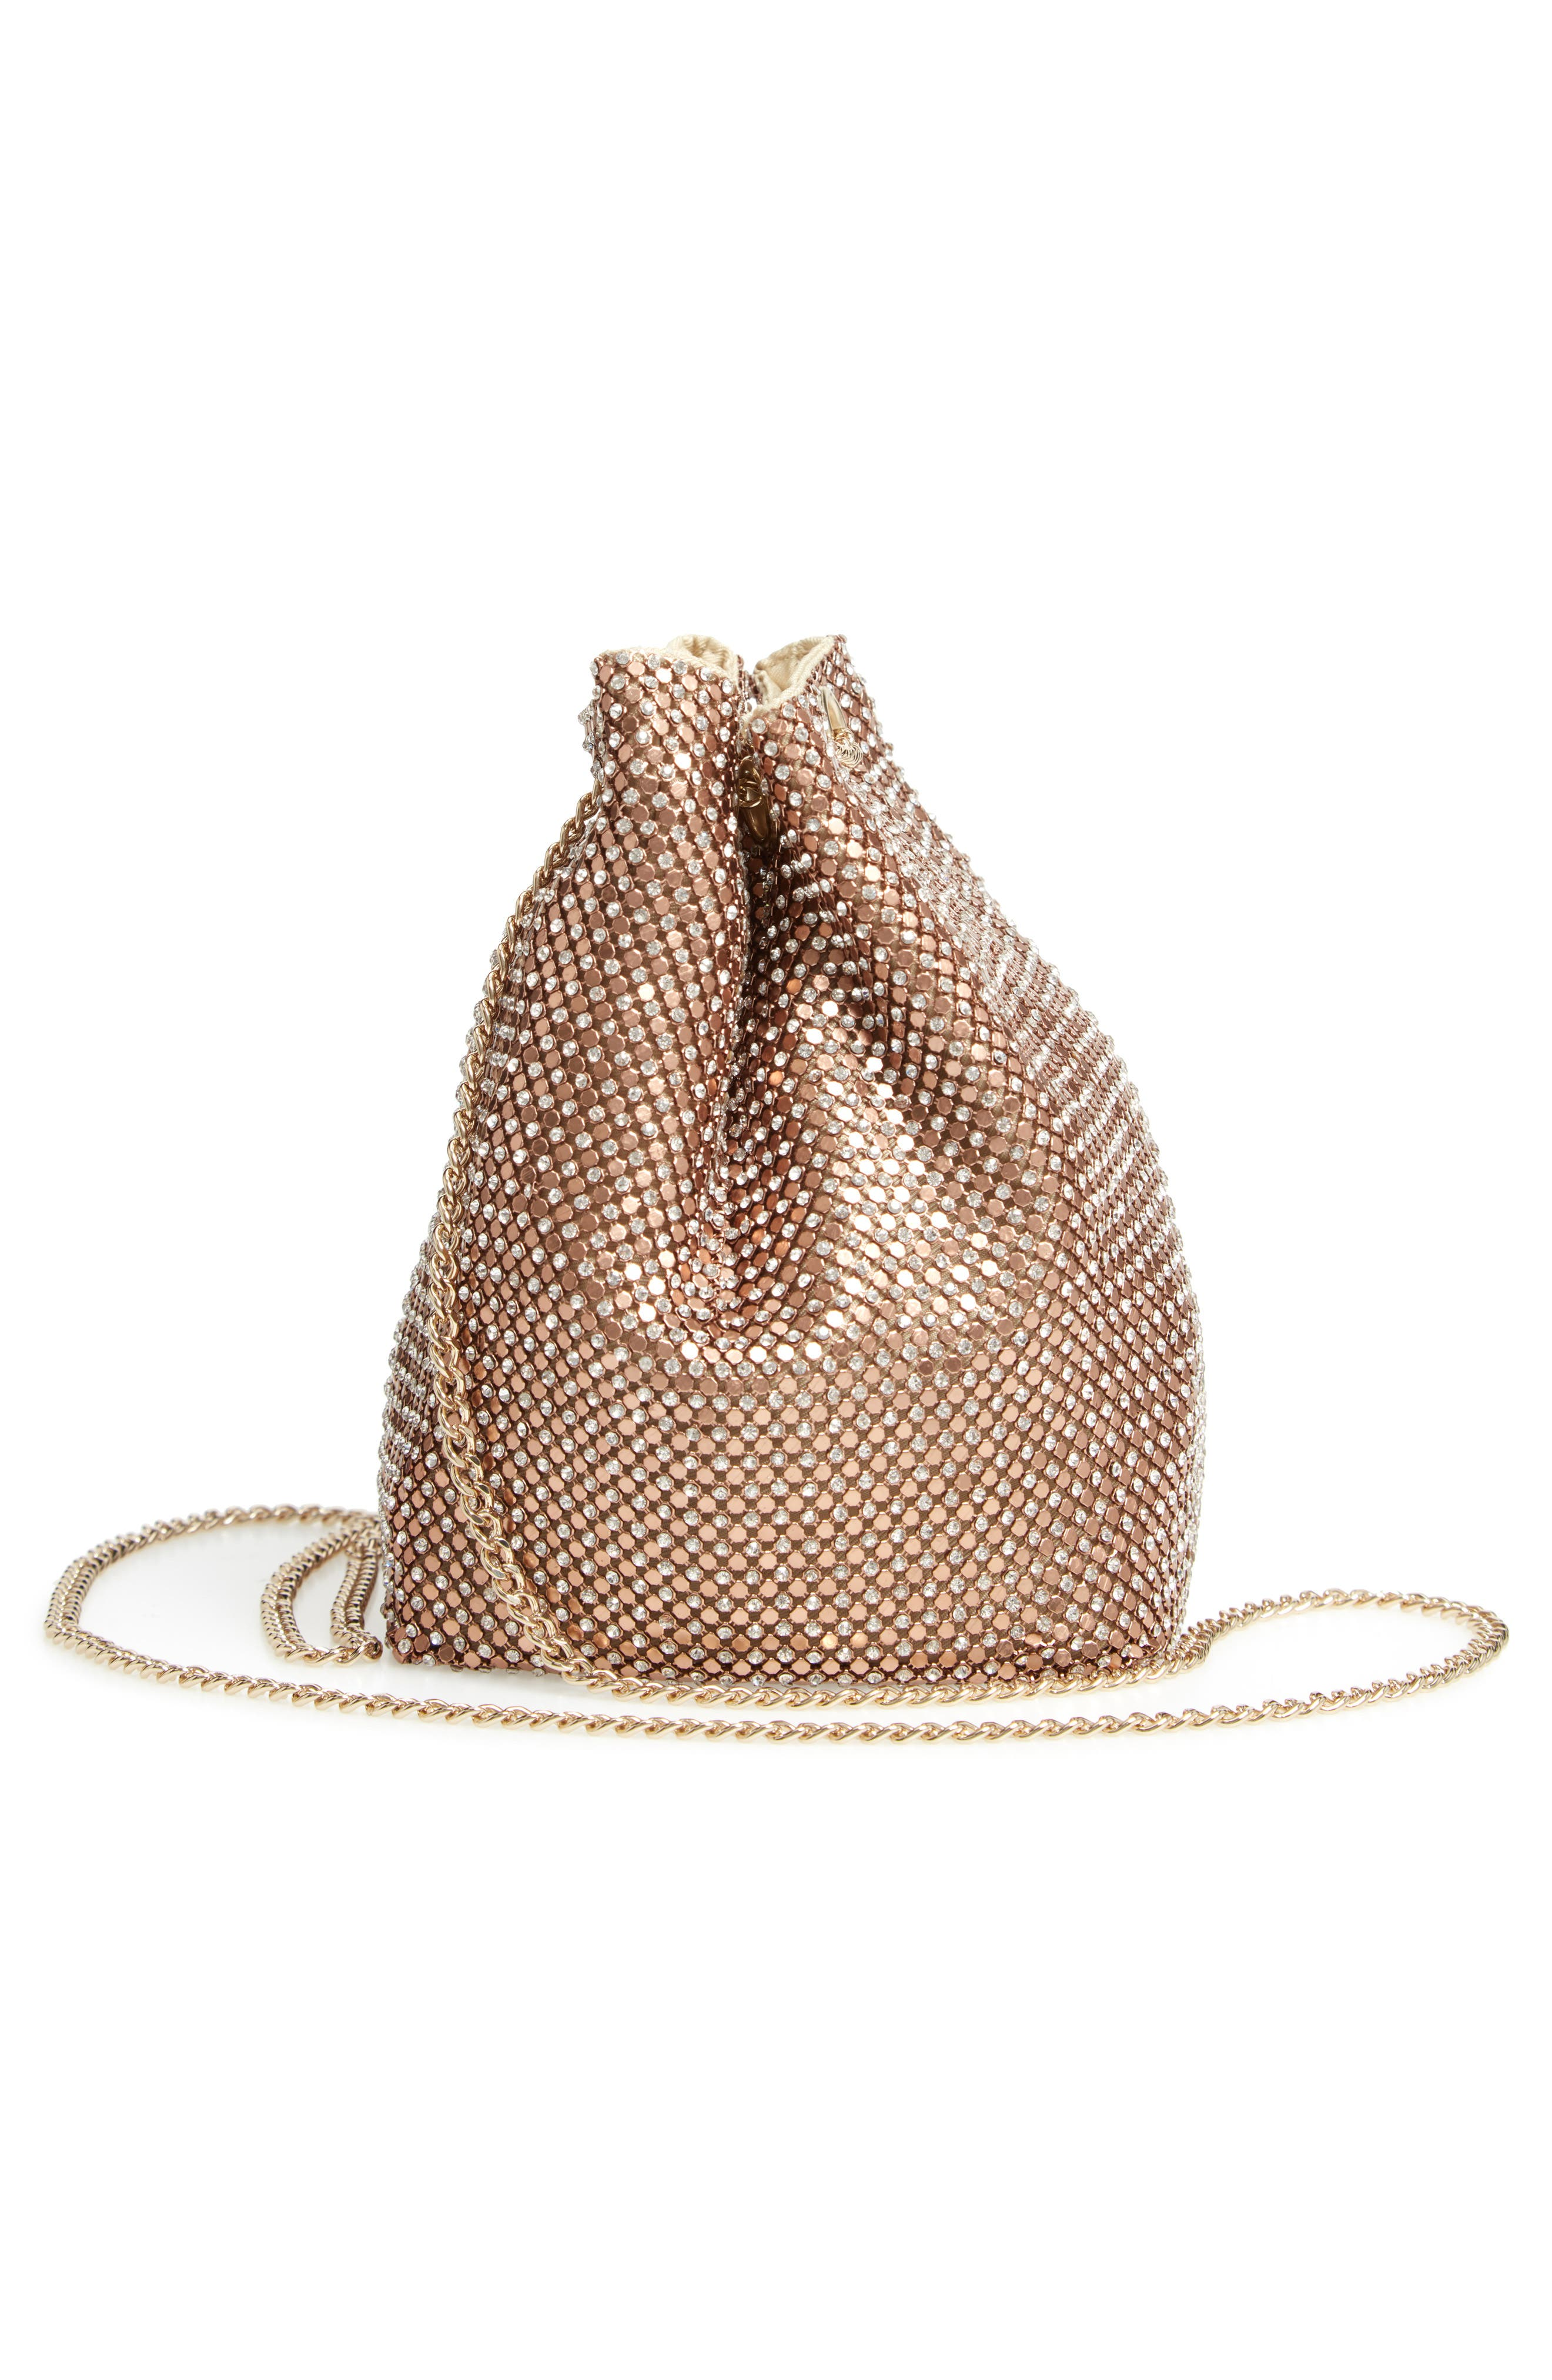 Crystal Mesh Crossbody Bucket Bag,                             Alternate thumbnail 5, color,                             ROSE GOLD